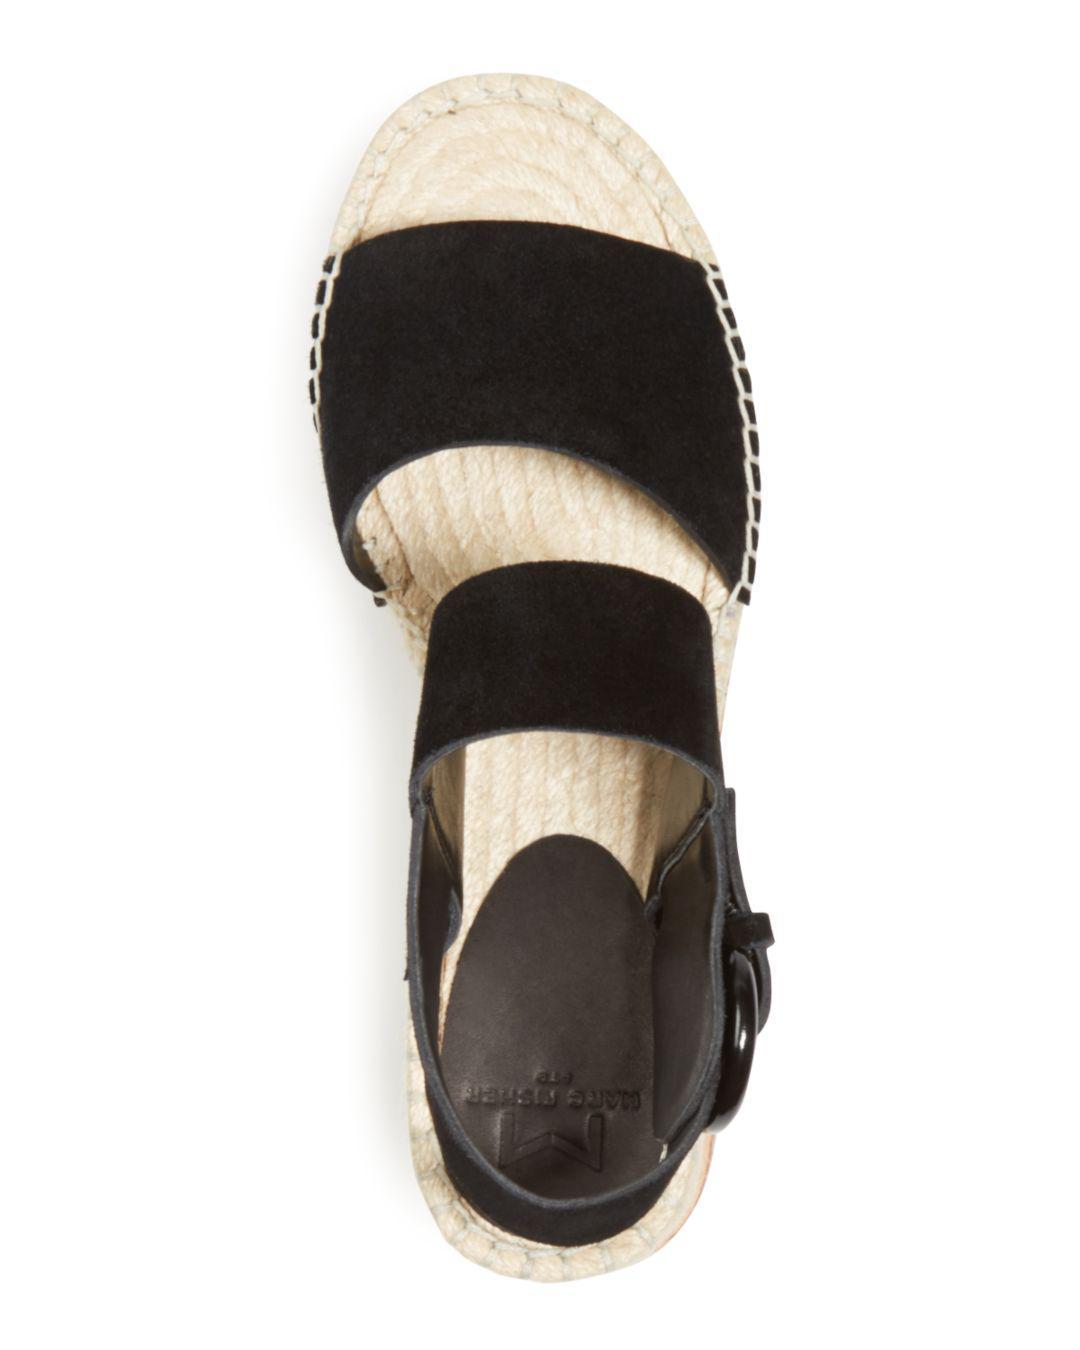 c8e84fd42a2c Marc Fisher - Black Women s Greely Suede Espadrille Wedge Platform Sandals  - Lyst. View fullscreen